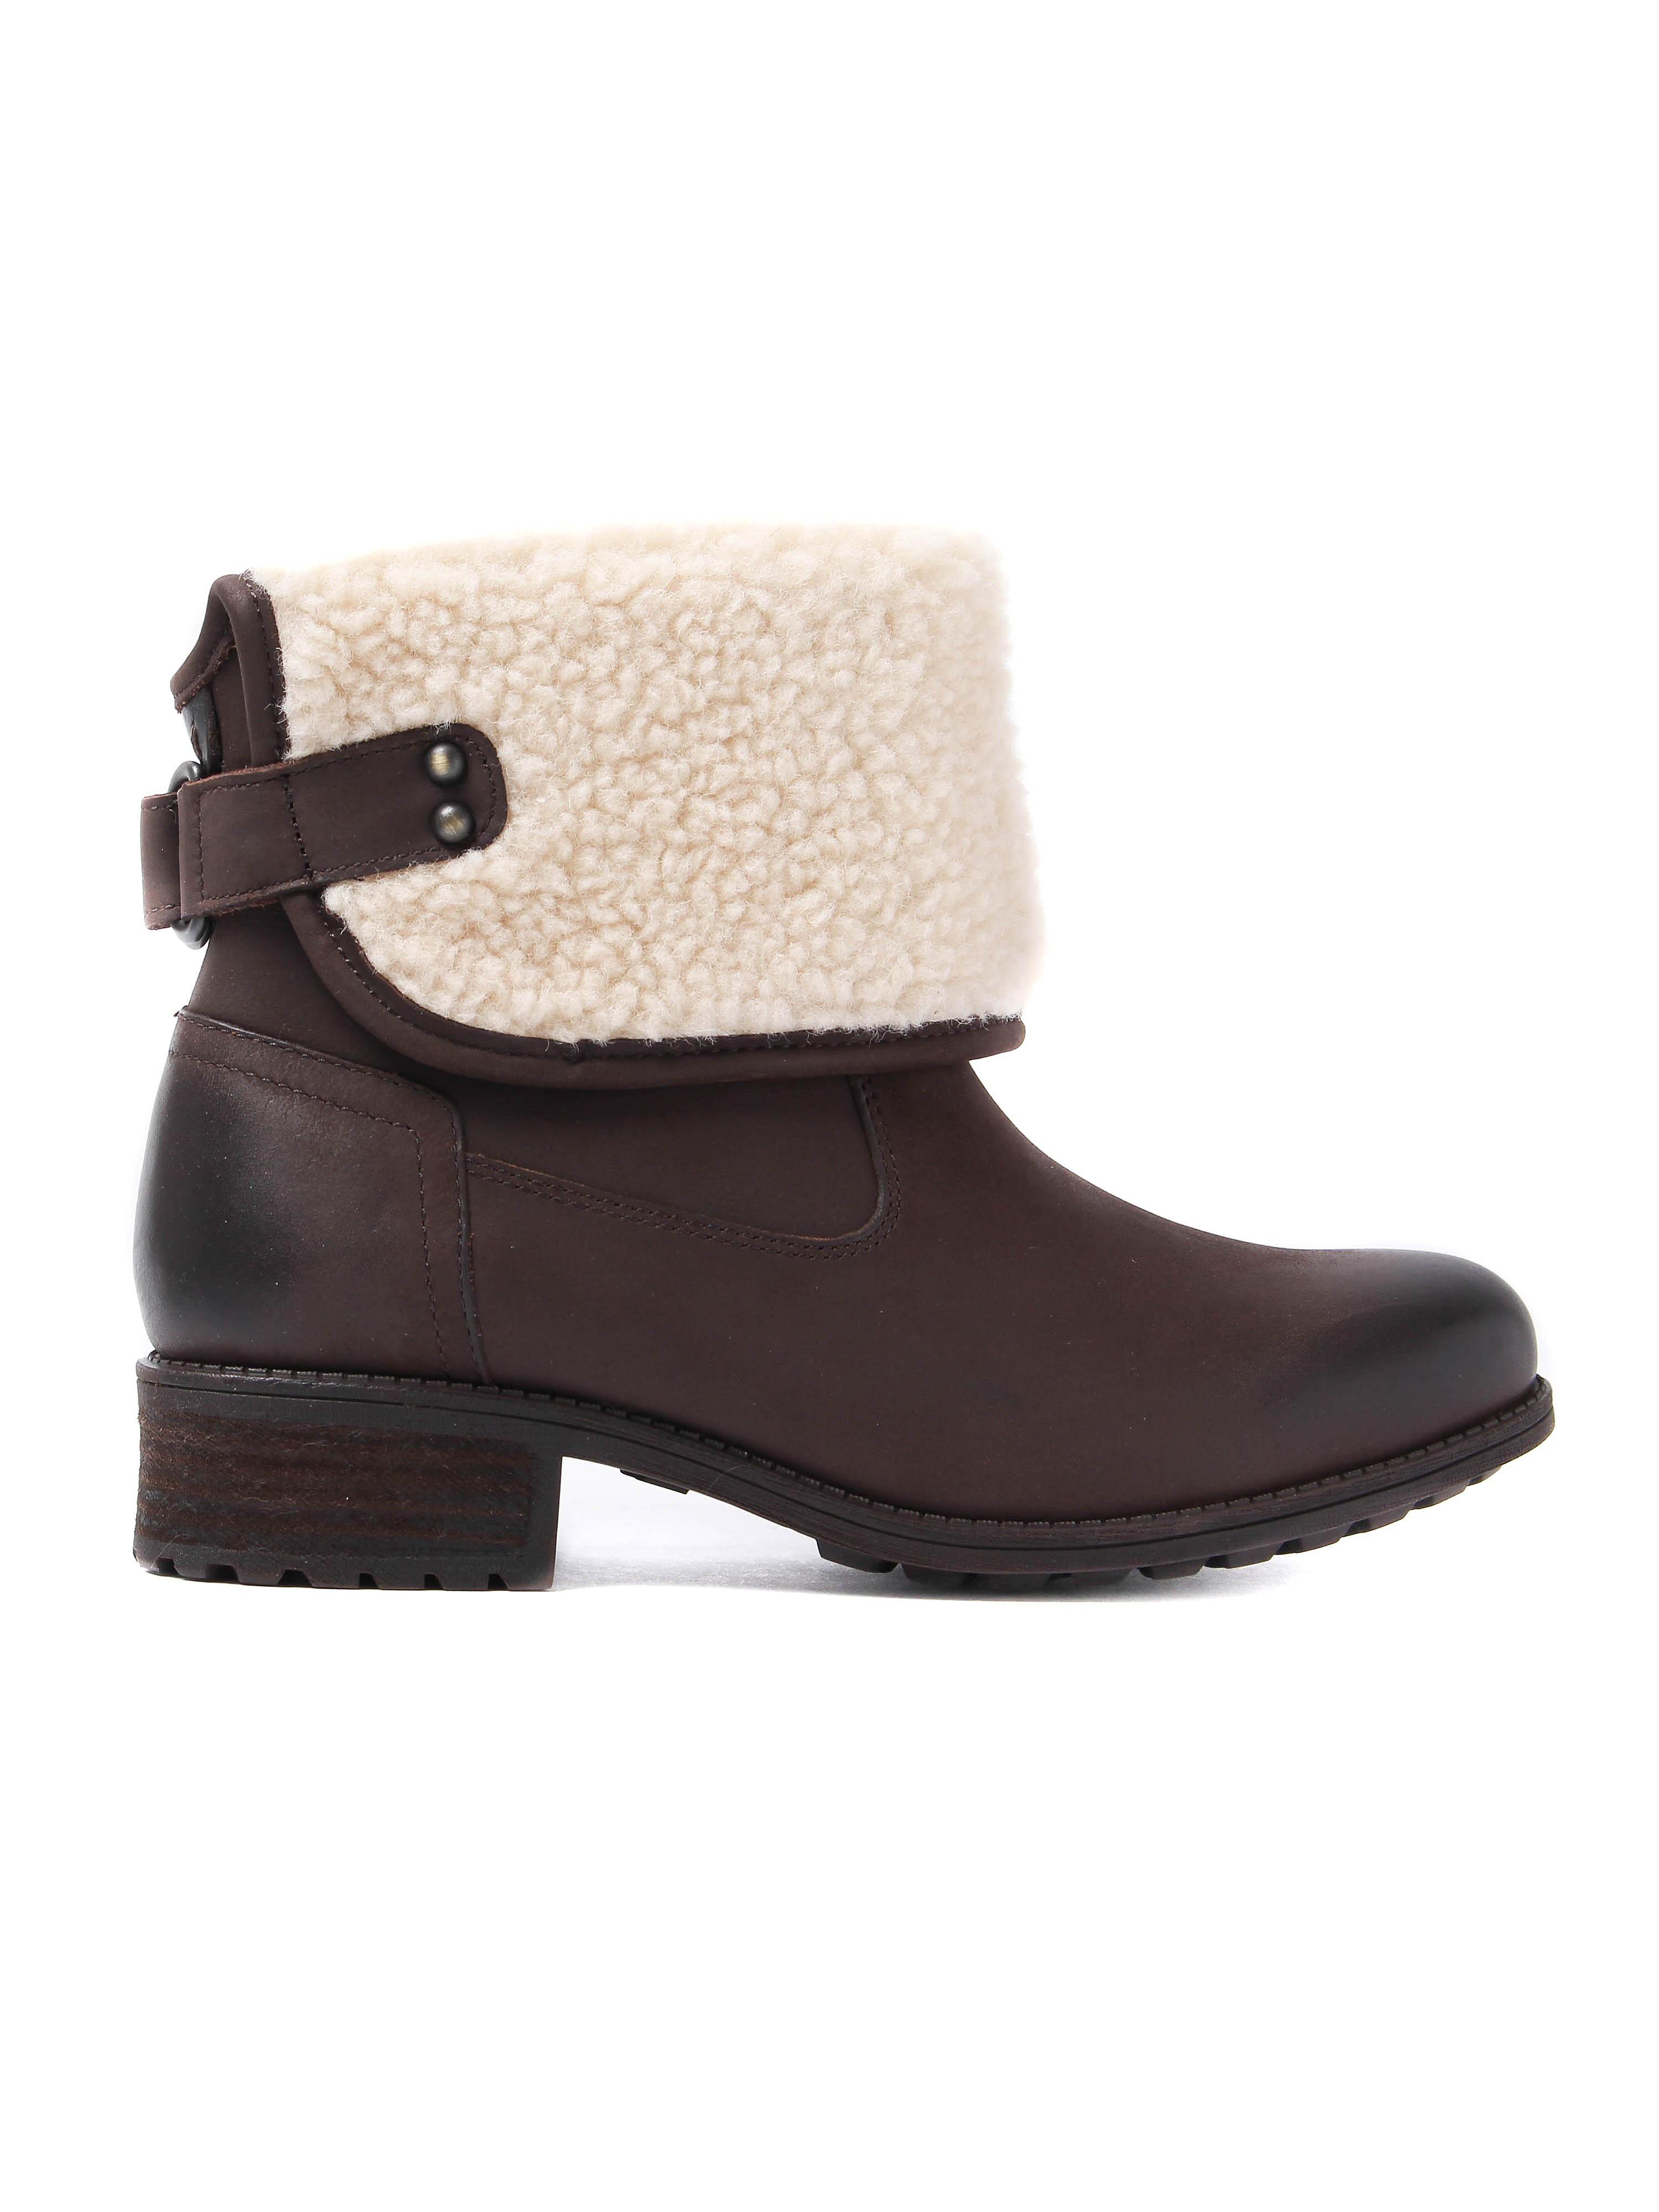 UGG Women's Aldon Boots - Stout